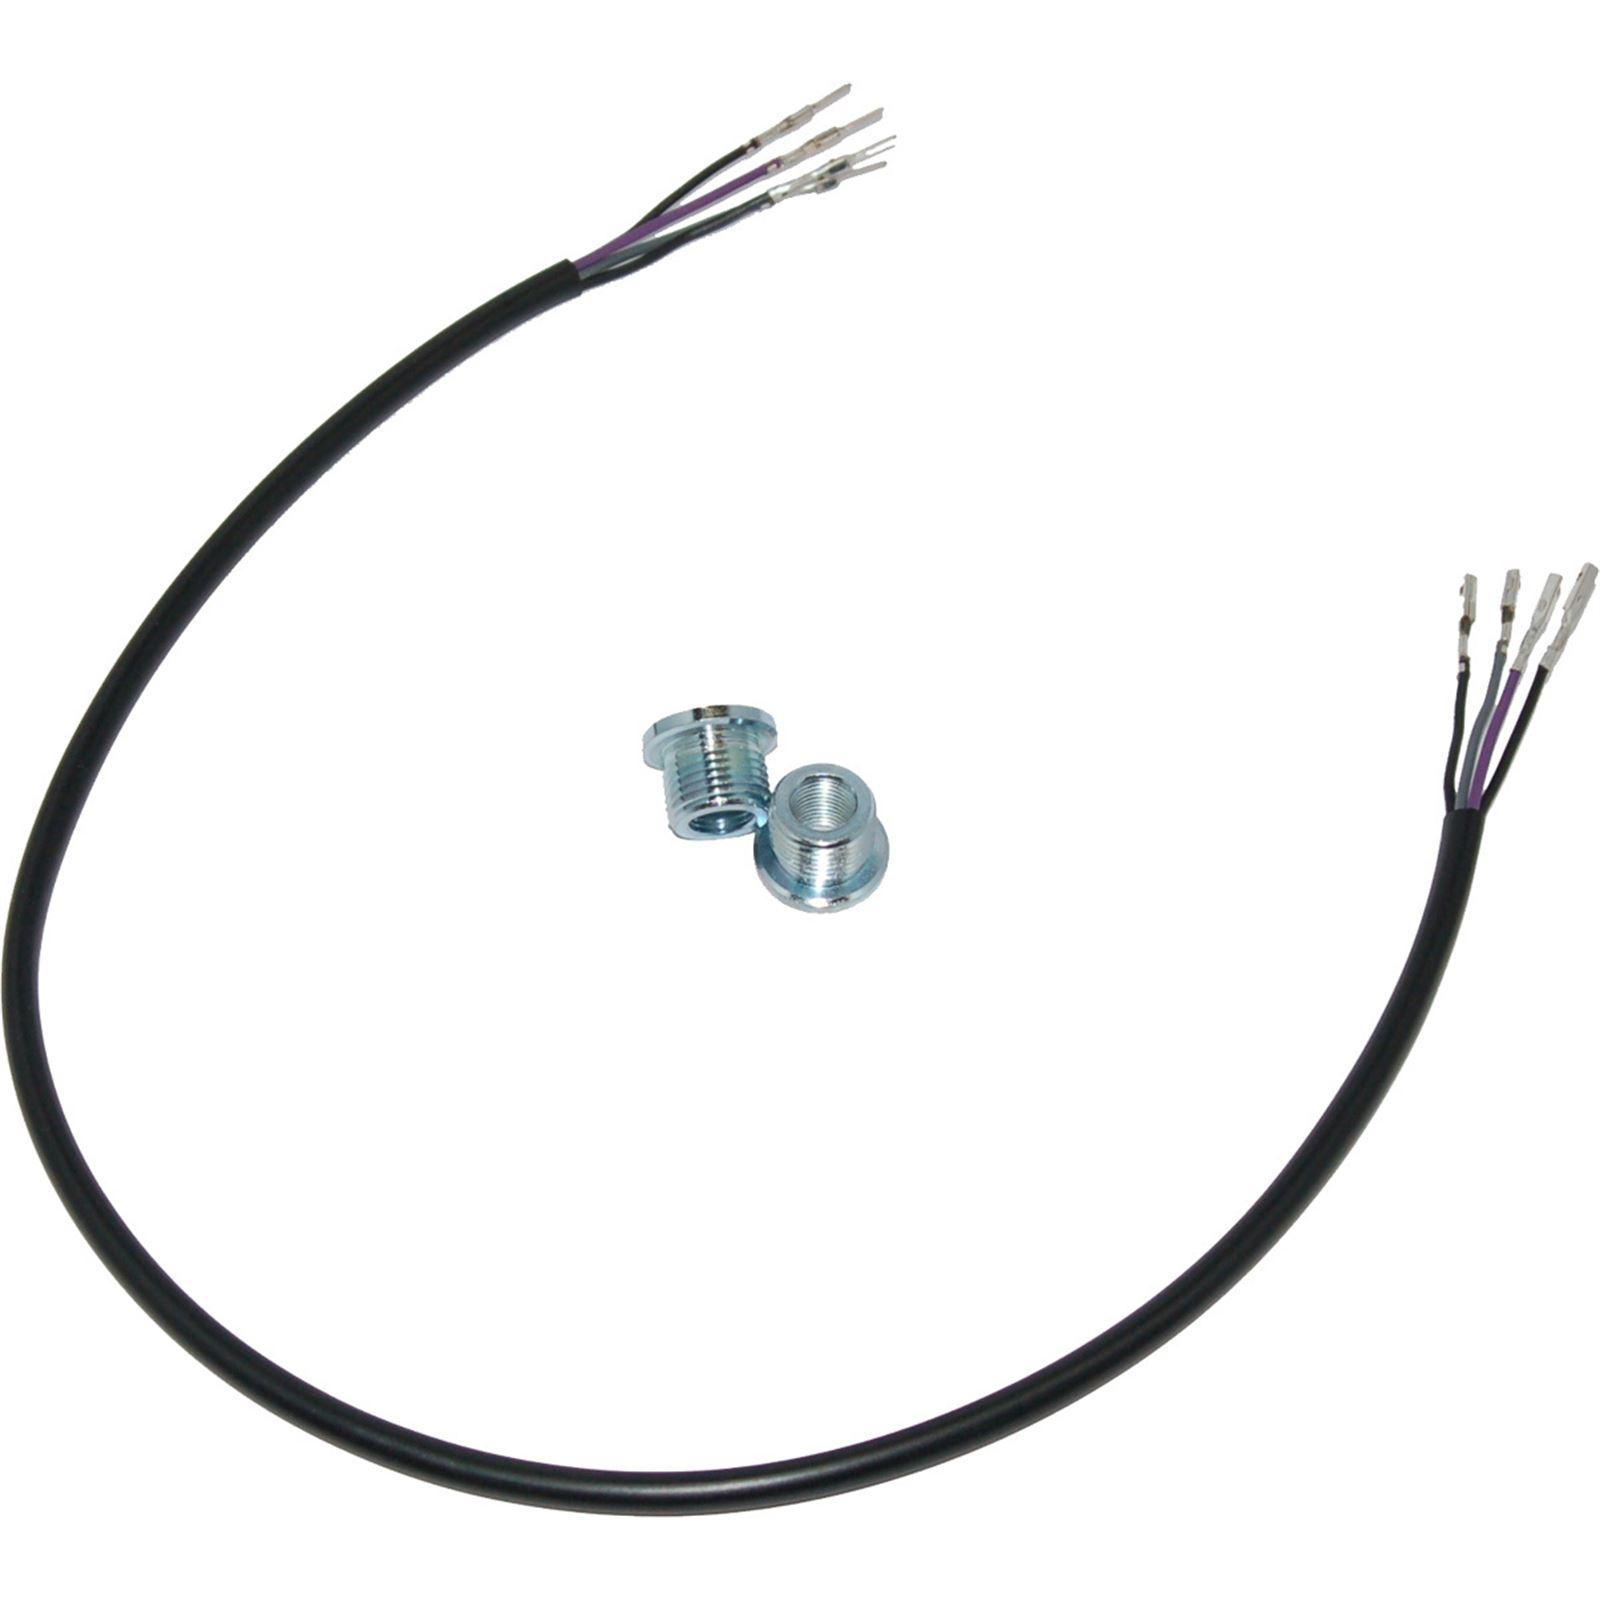 Namz Adapters 02 Sensor 18/12mm